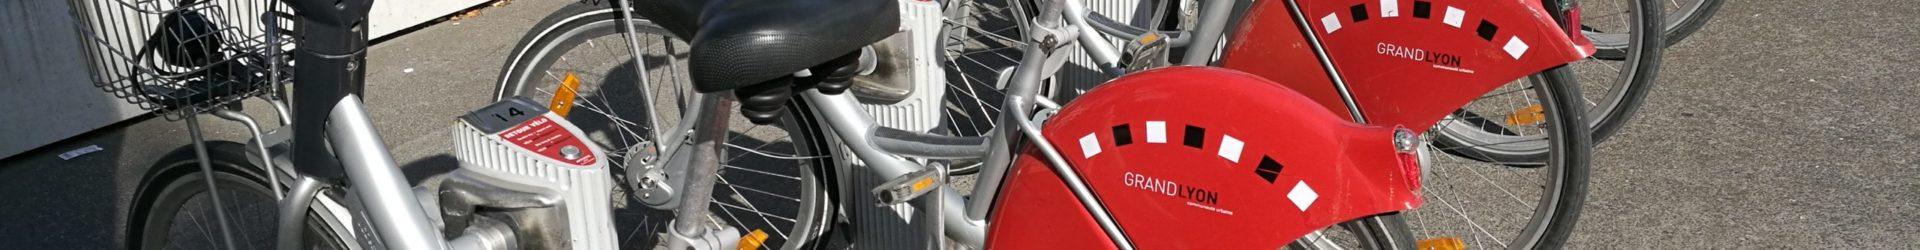 Vélo'v : 5 astuces indispensables